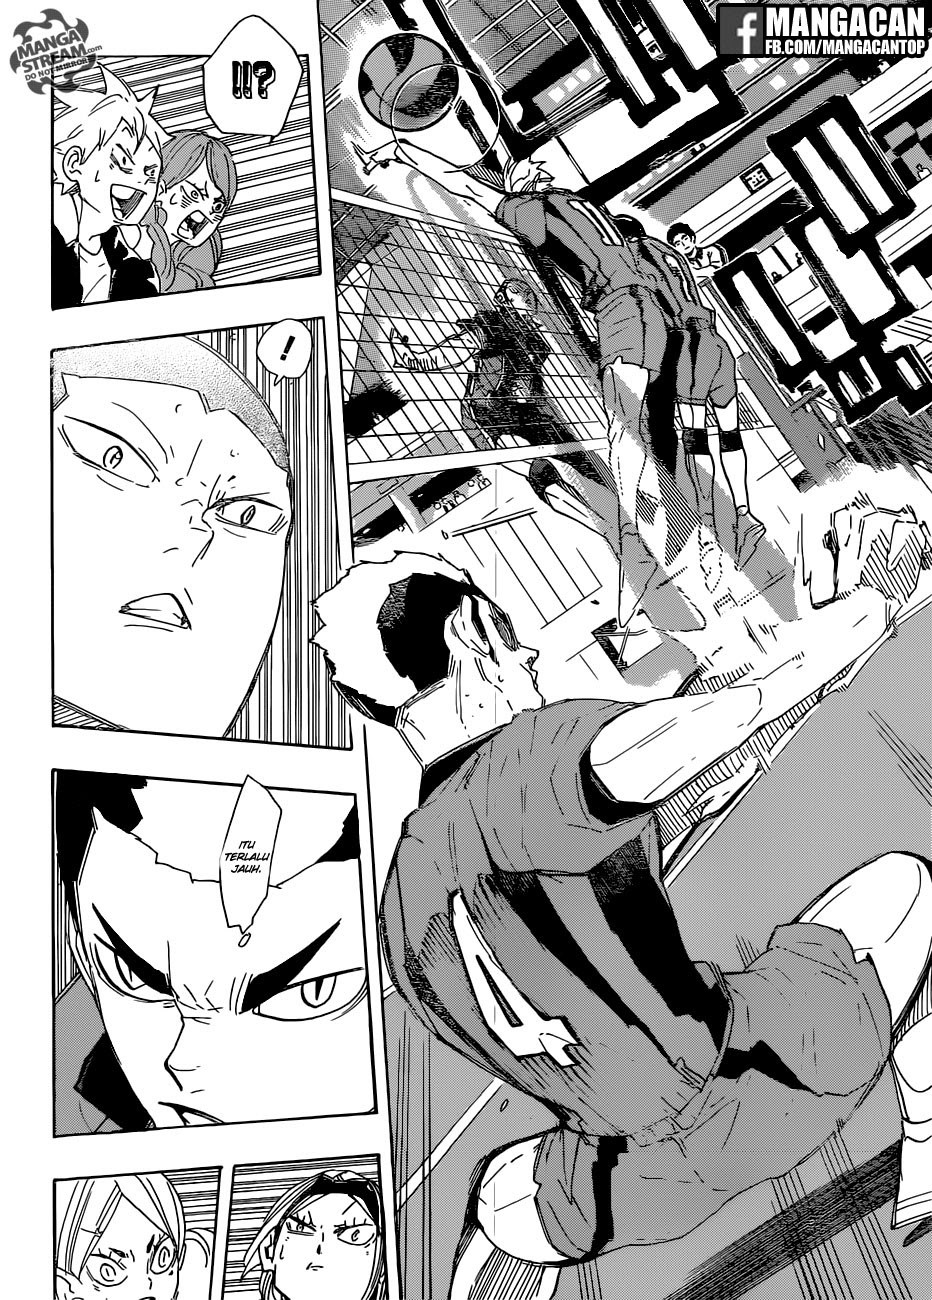 Haikyuu!!: Chapter 294 - Page 11